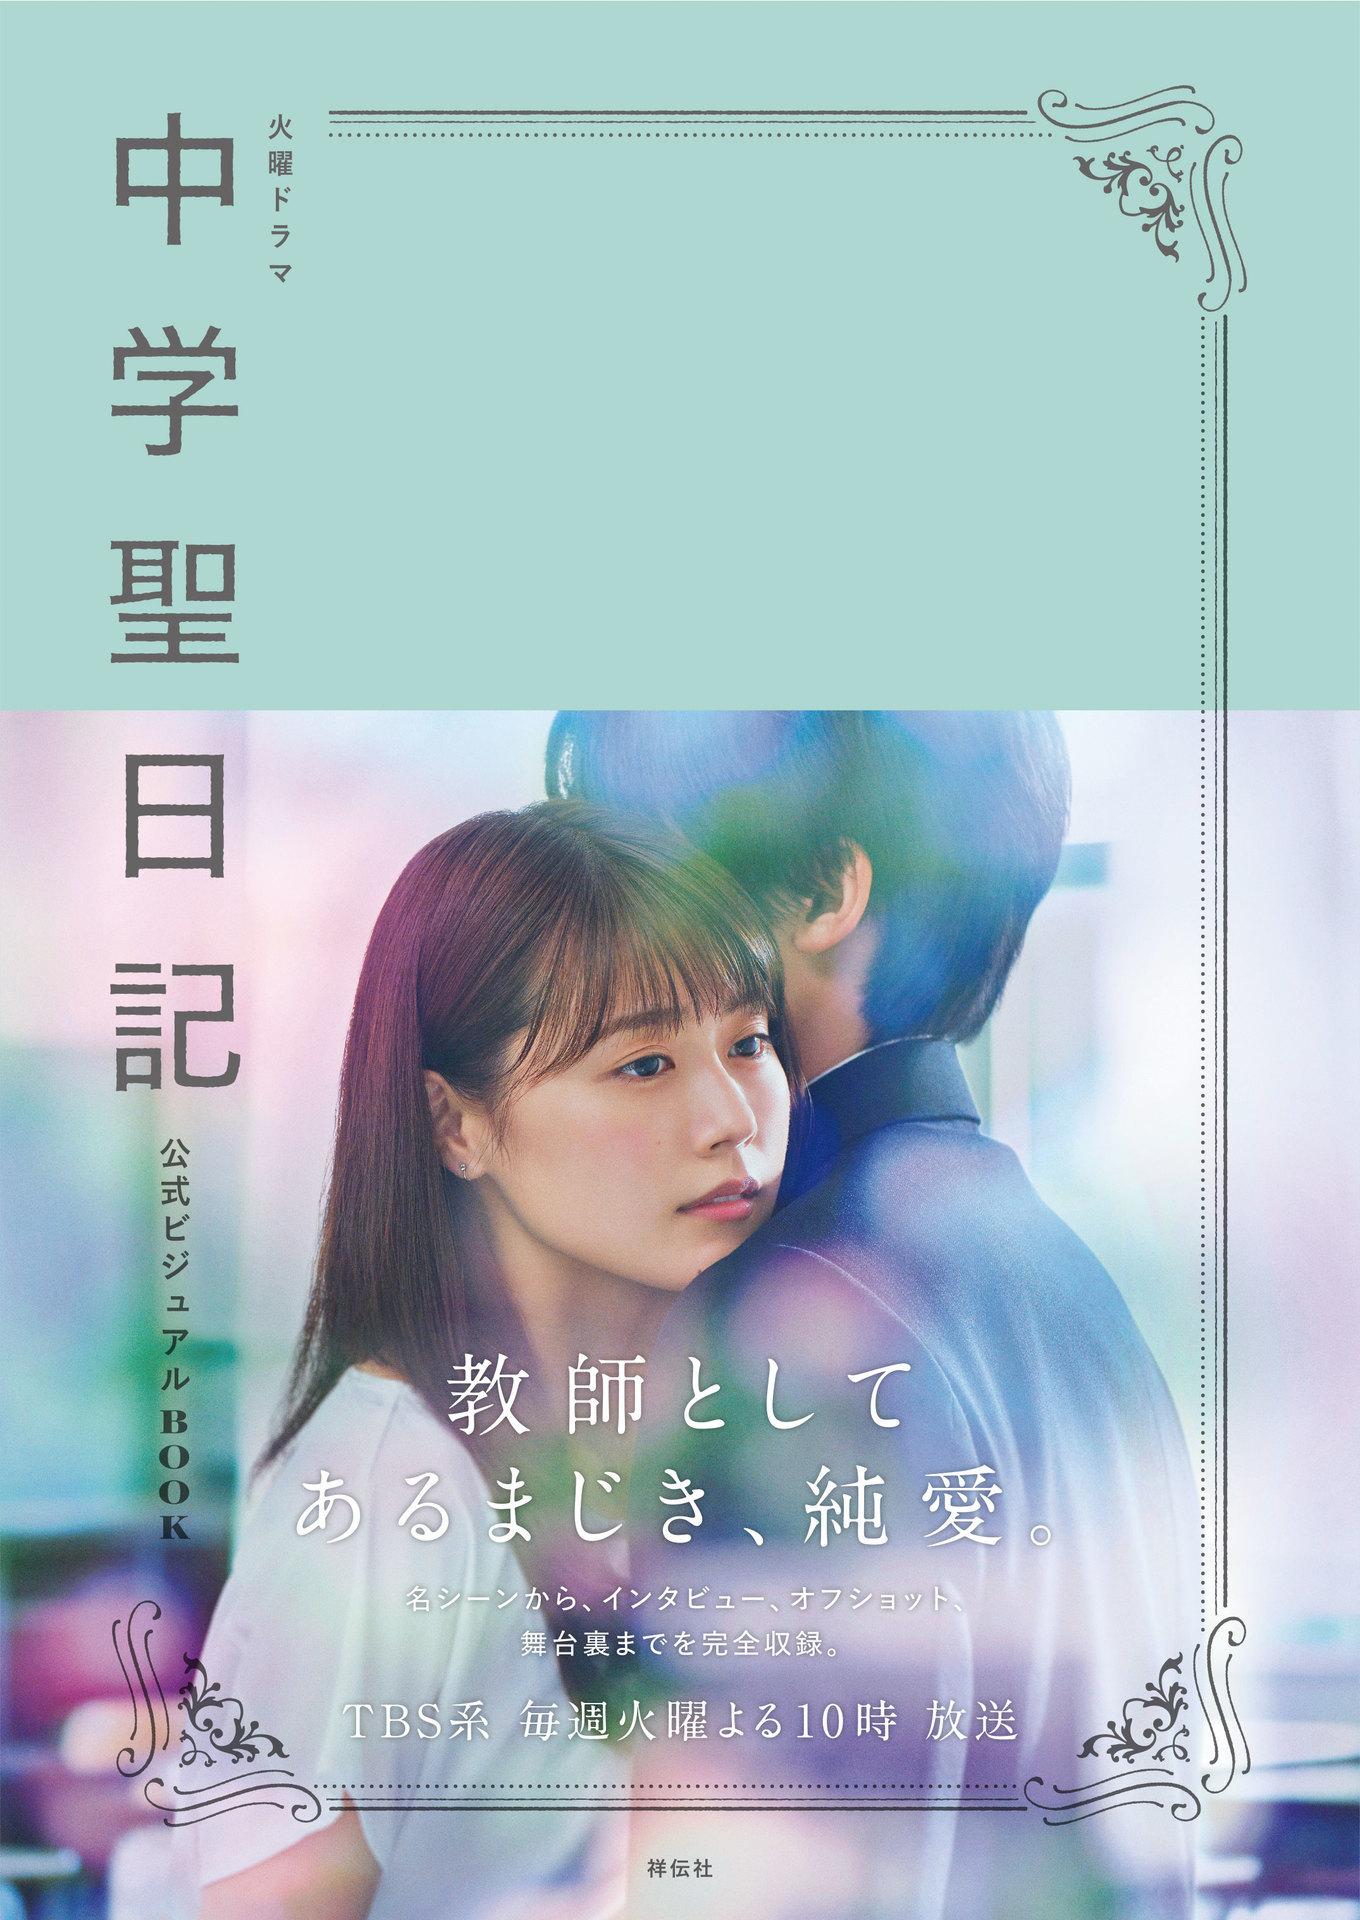 chugaku_cover-obi_F2_web.jpg